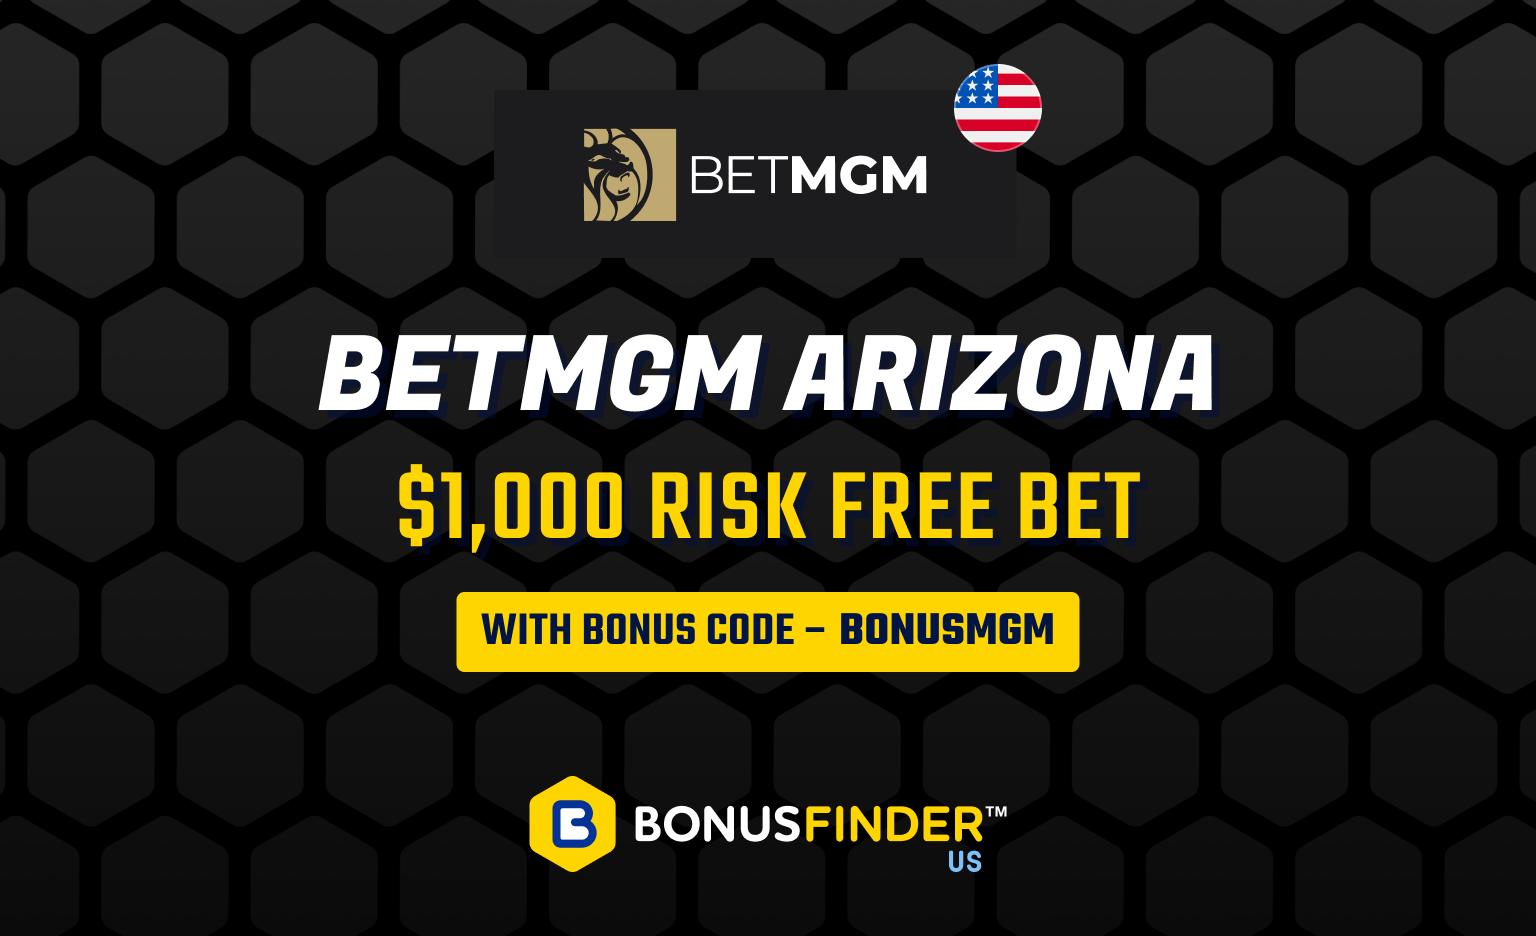 BetMGM AZ bonus code